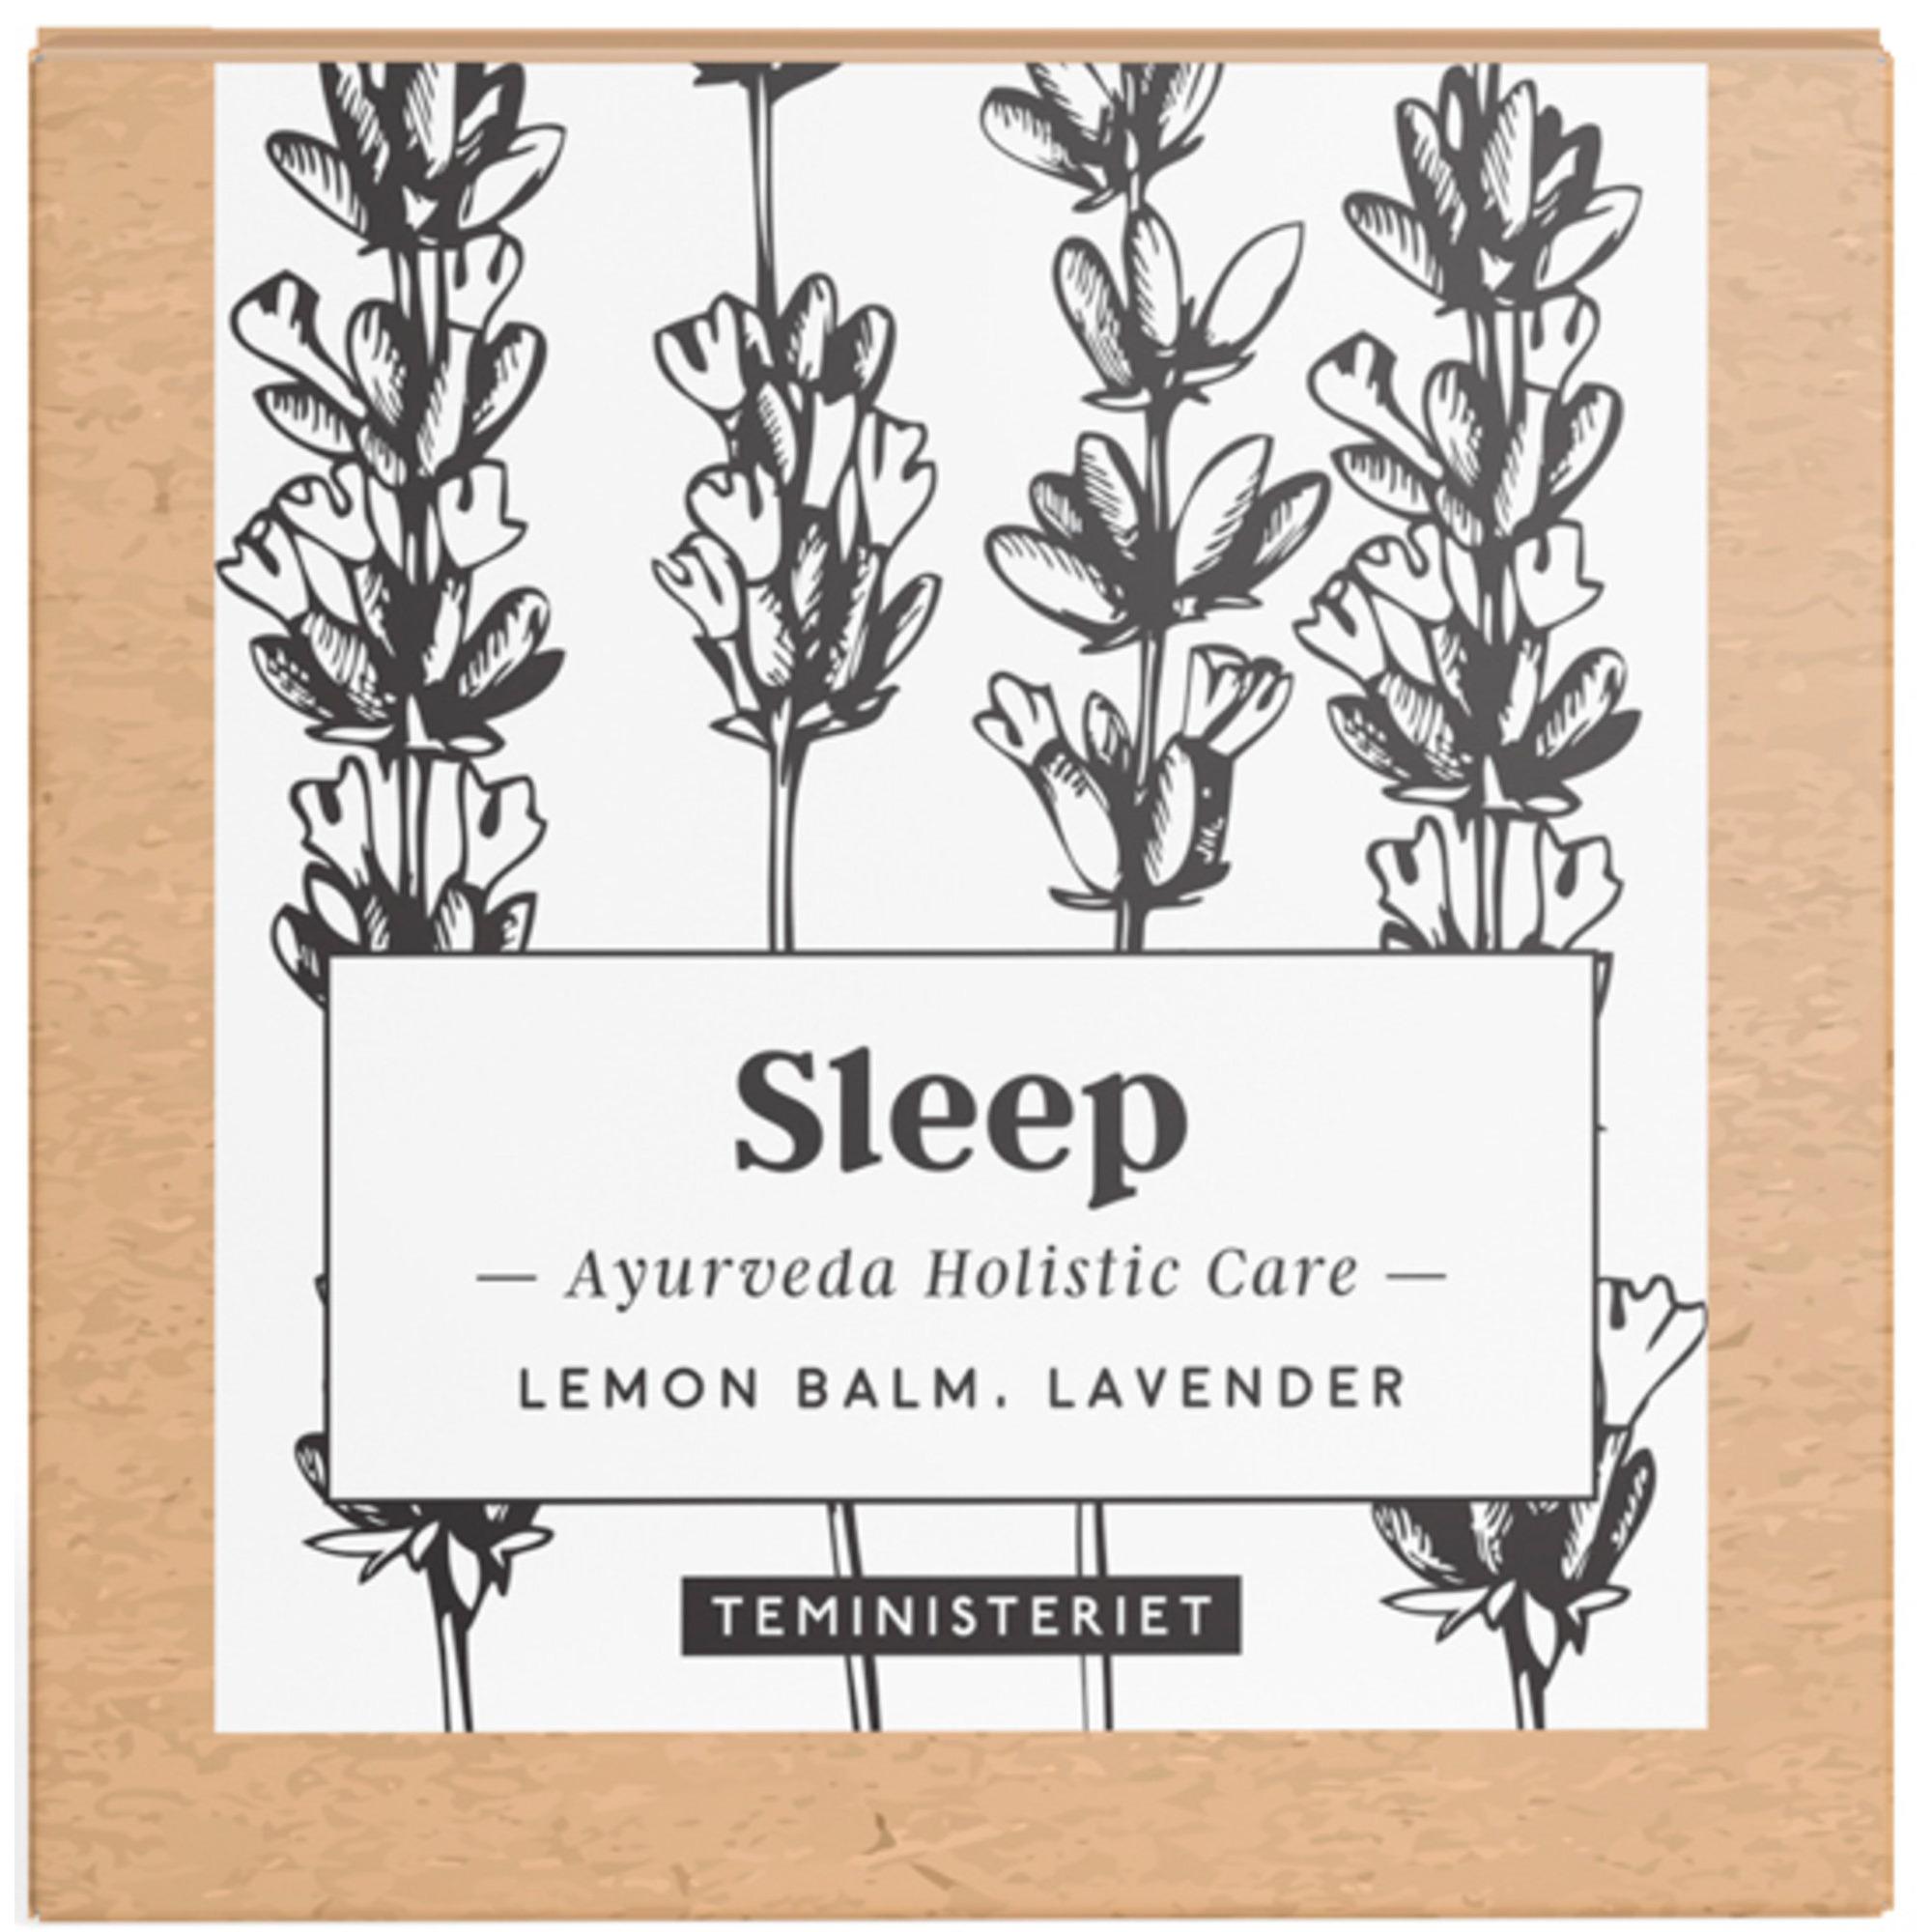 Teministeriet Ayurveda Sleep tepåsar 50 g.